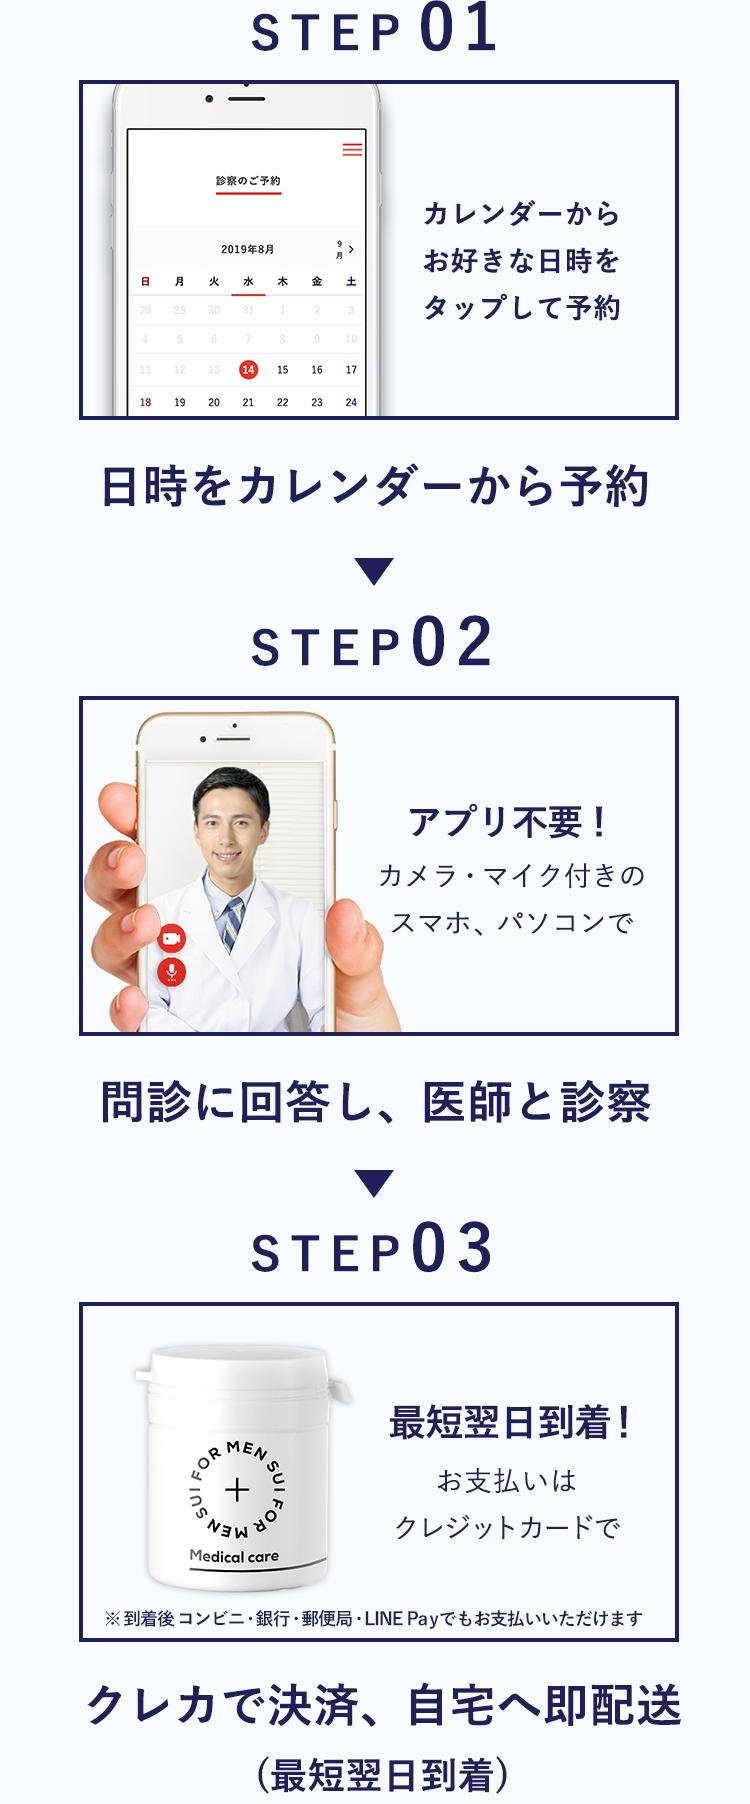 STEP01. 日時をカレンダーから予約 | STEP02. 問診に回答し、医師と診察 | STEP03. クレカで決済、自宅へ即配送